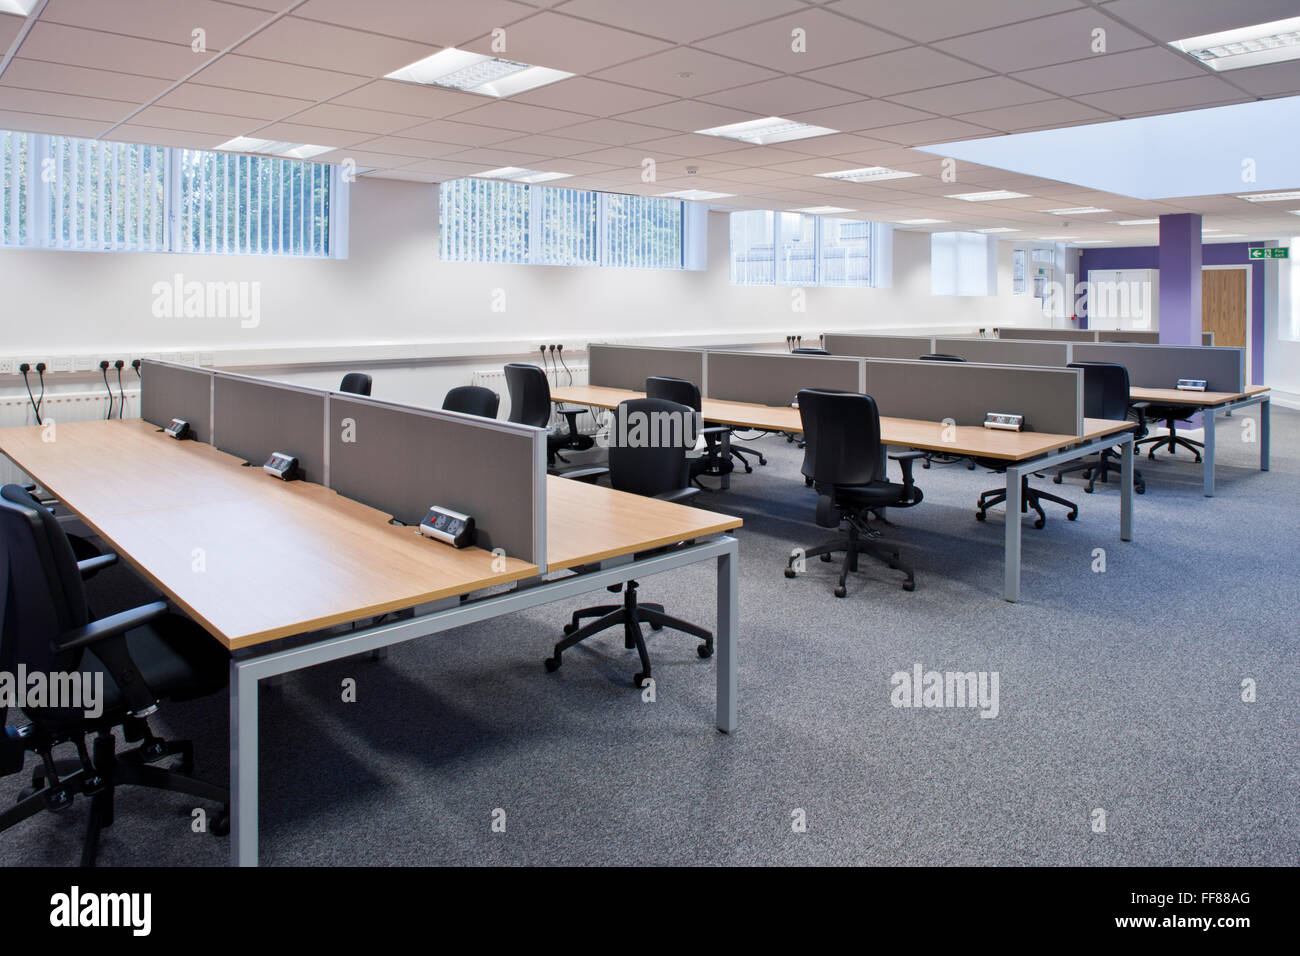 modern open plan office - Stock Image